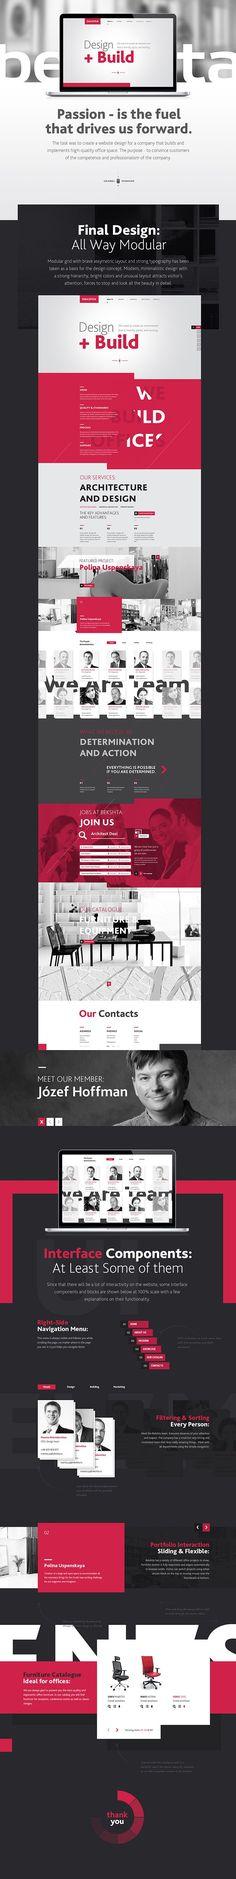 Bekshta Corporate Website: